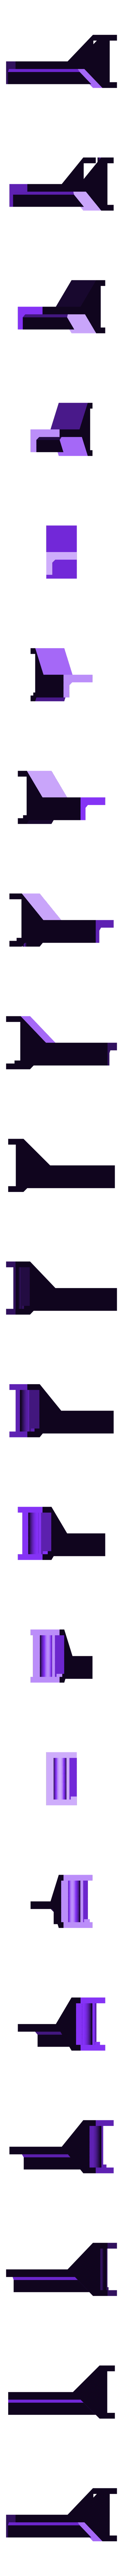 k8200_mounting_bracket1.stl Download free STL file Geared Extruder 2 • Design to 3D print, Job